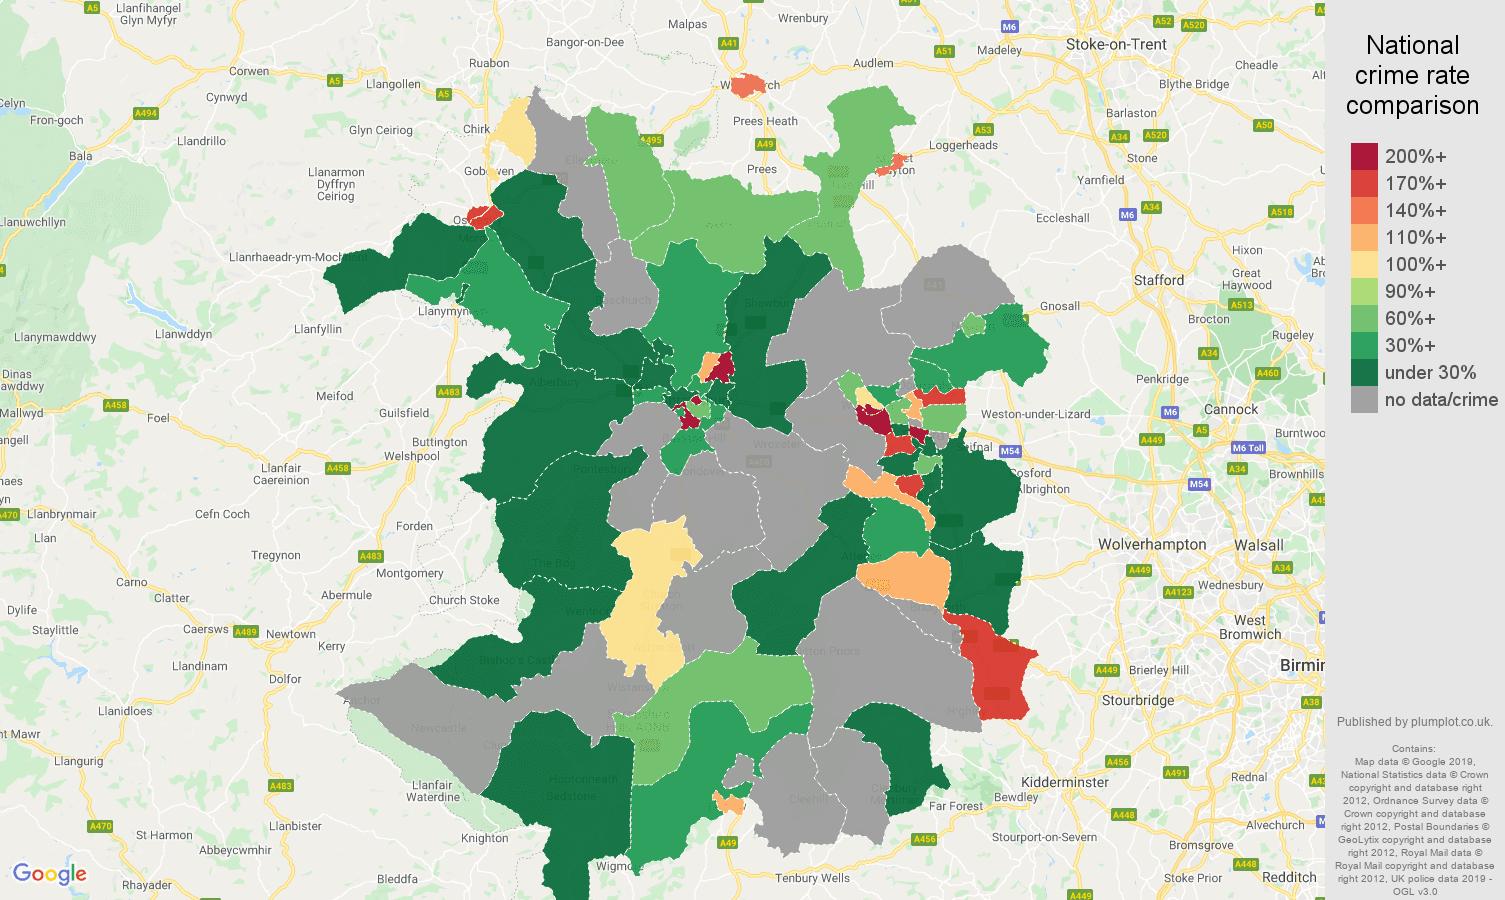 Shropshire shoplifting crime rate comparison map